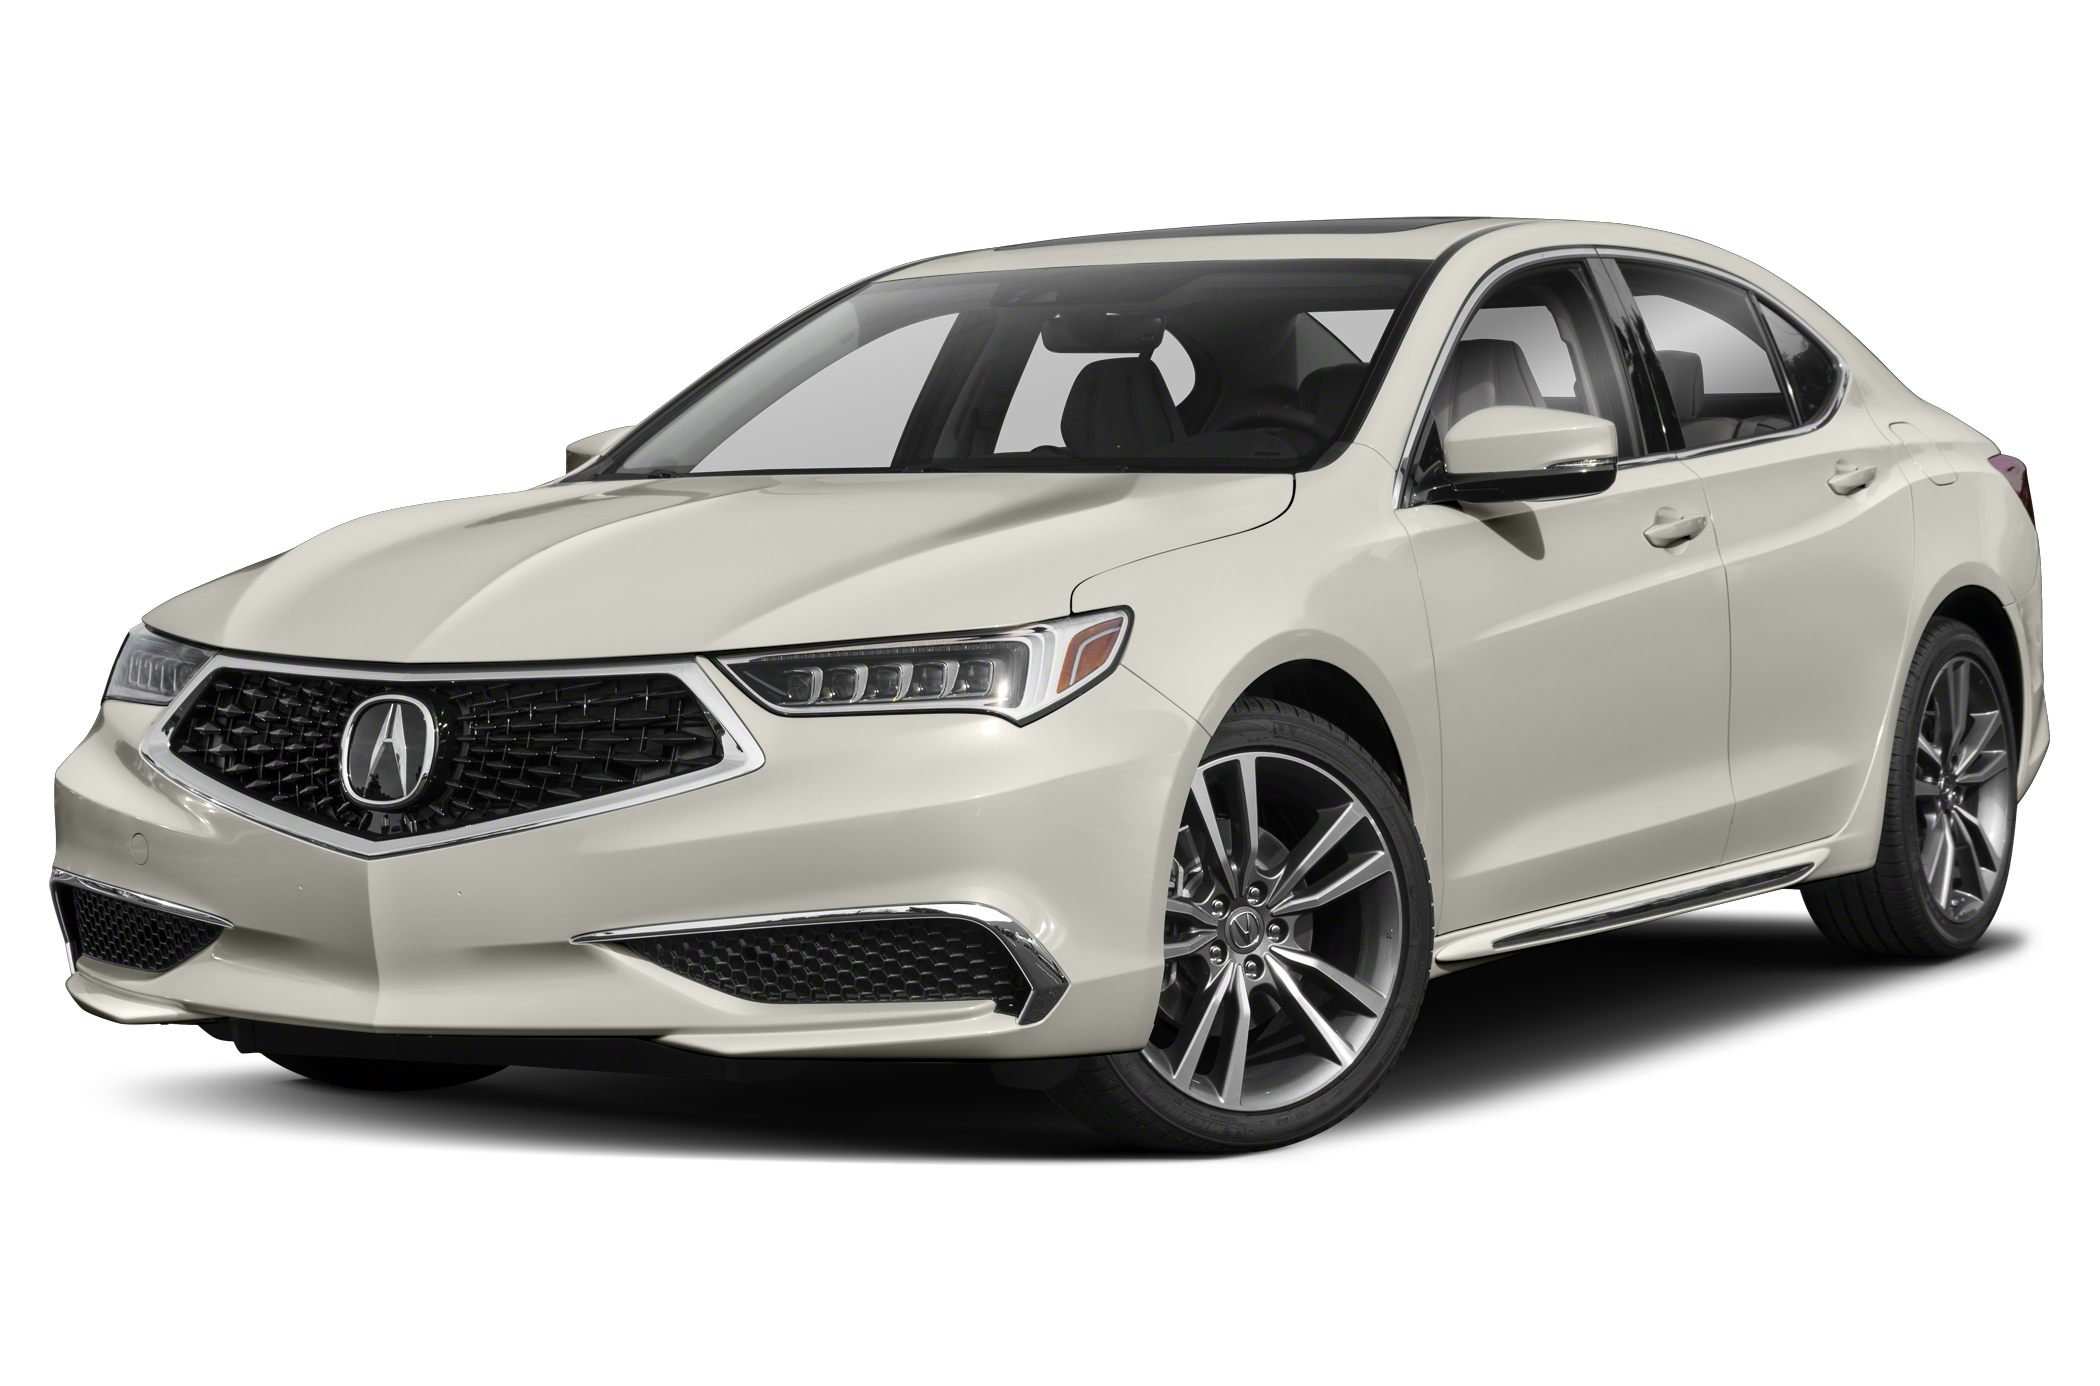 2020 Acura TLX 3.5L Tech Pkg 4dr Front-wheel Drive Sedan